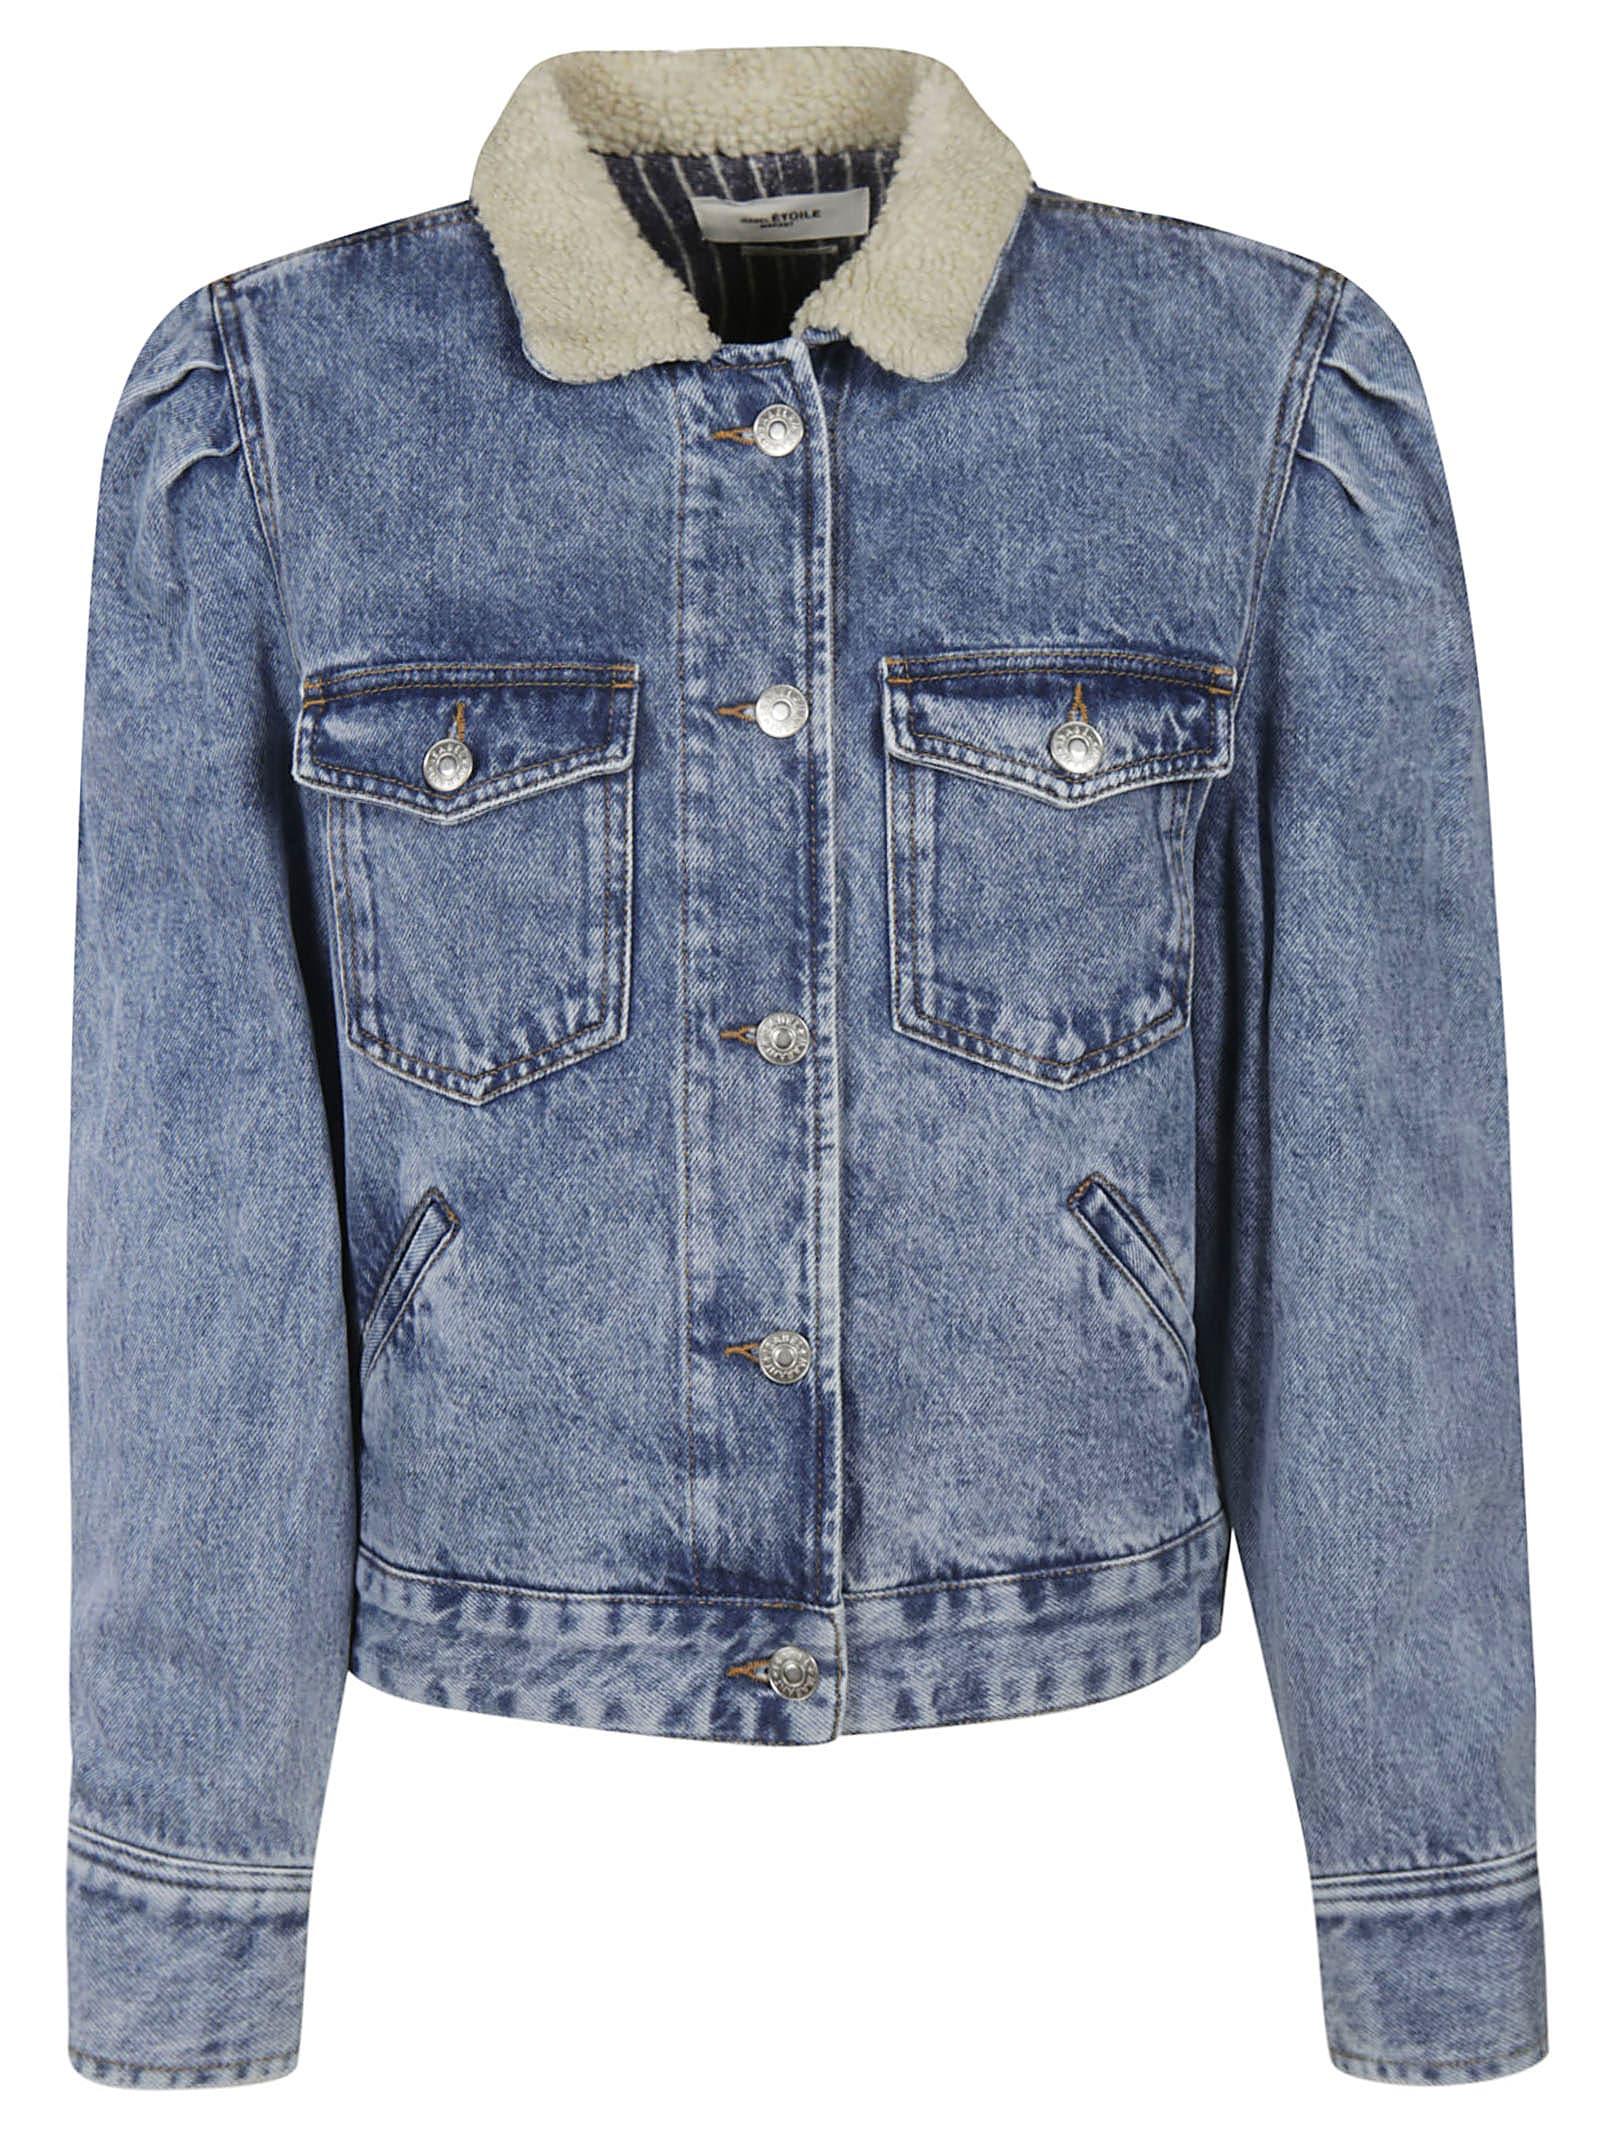 Isabel Marant Buttoned Jacket